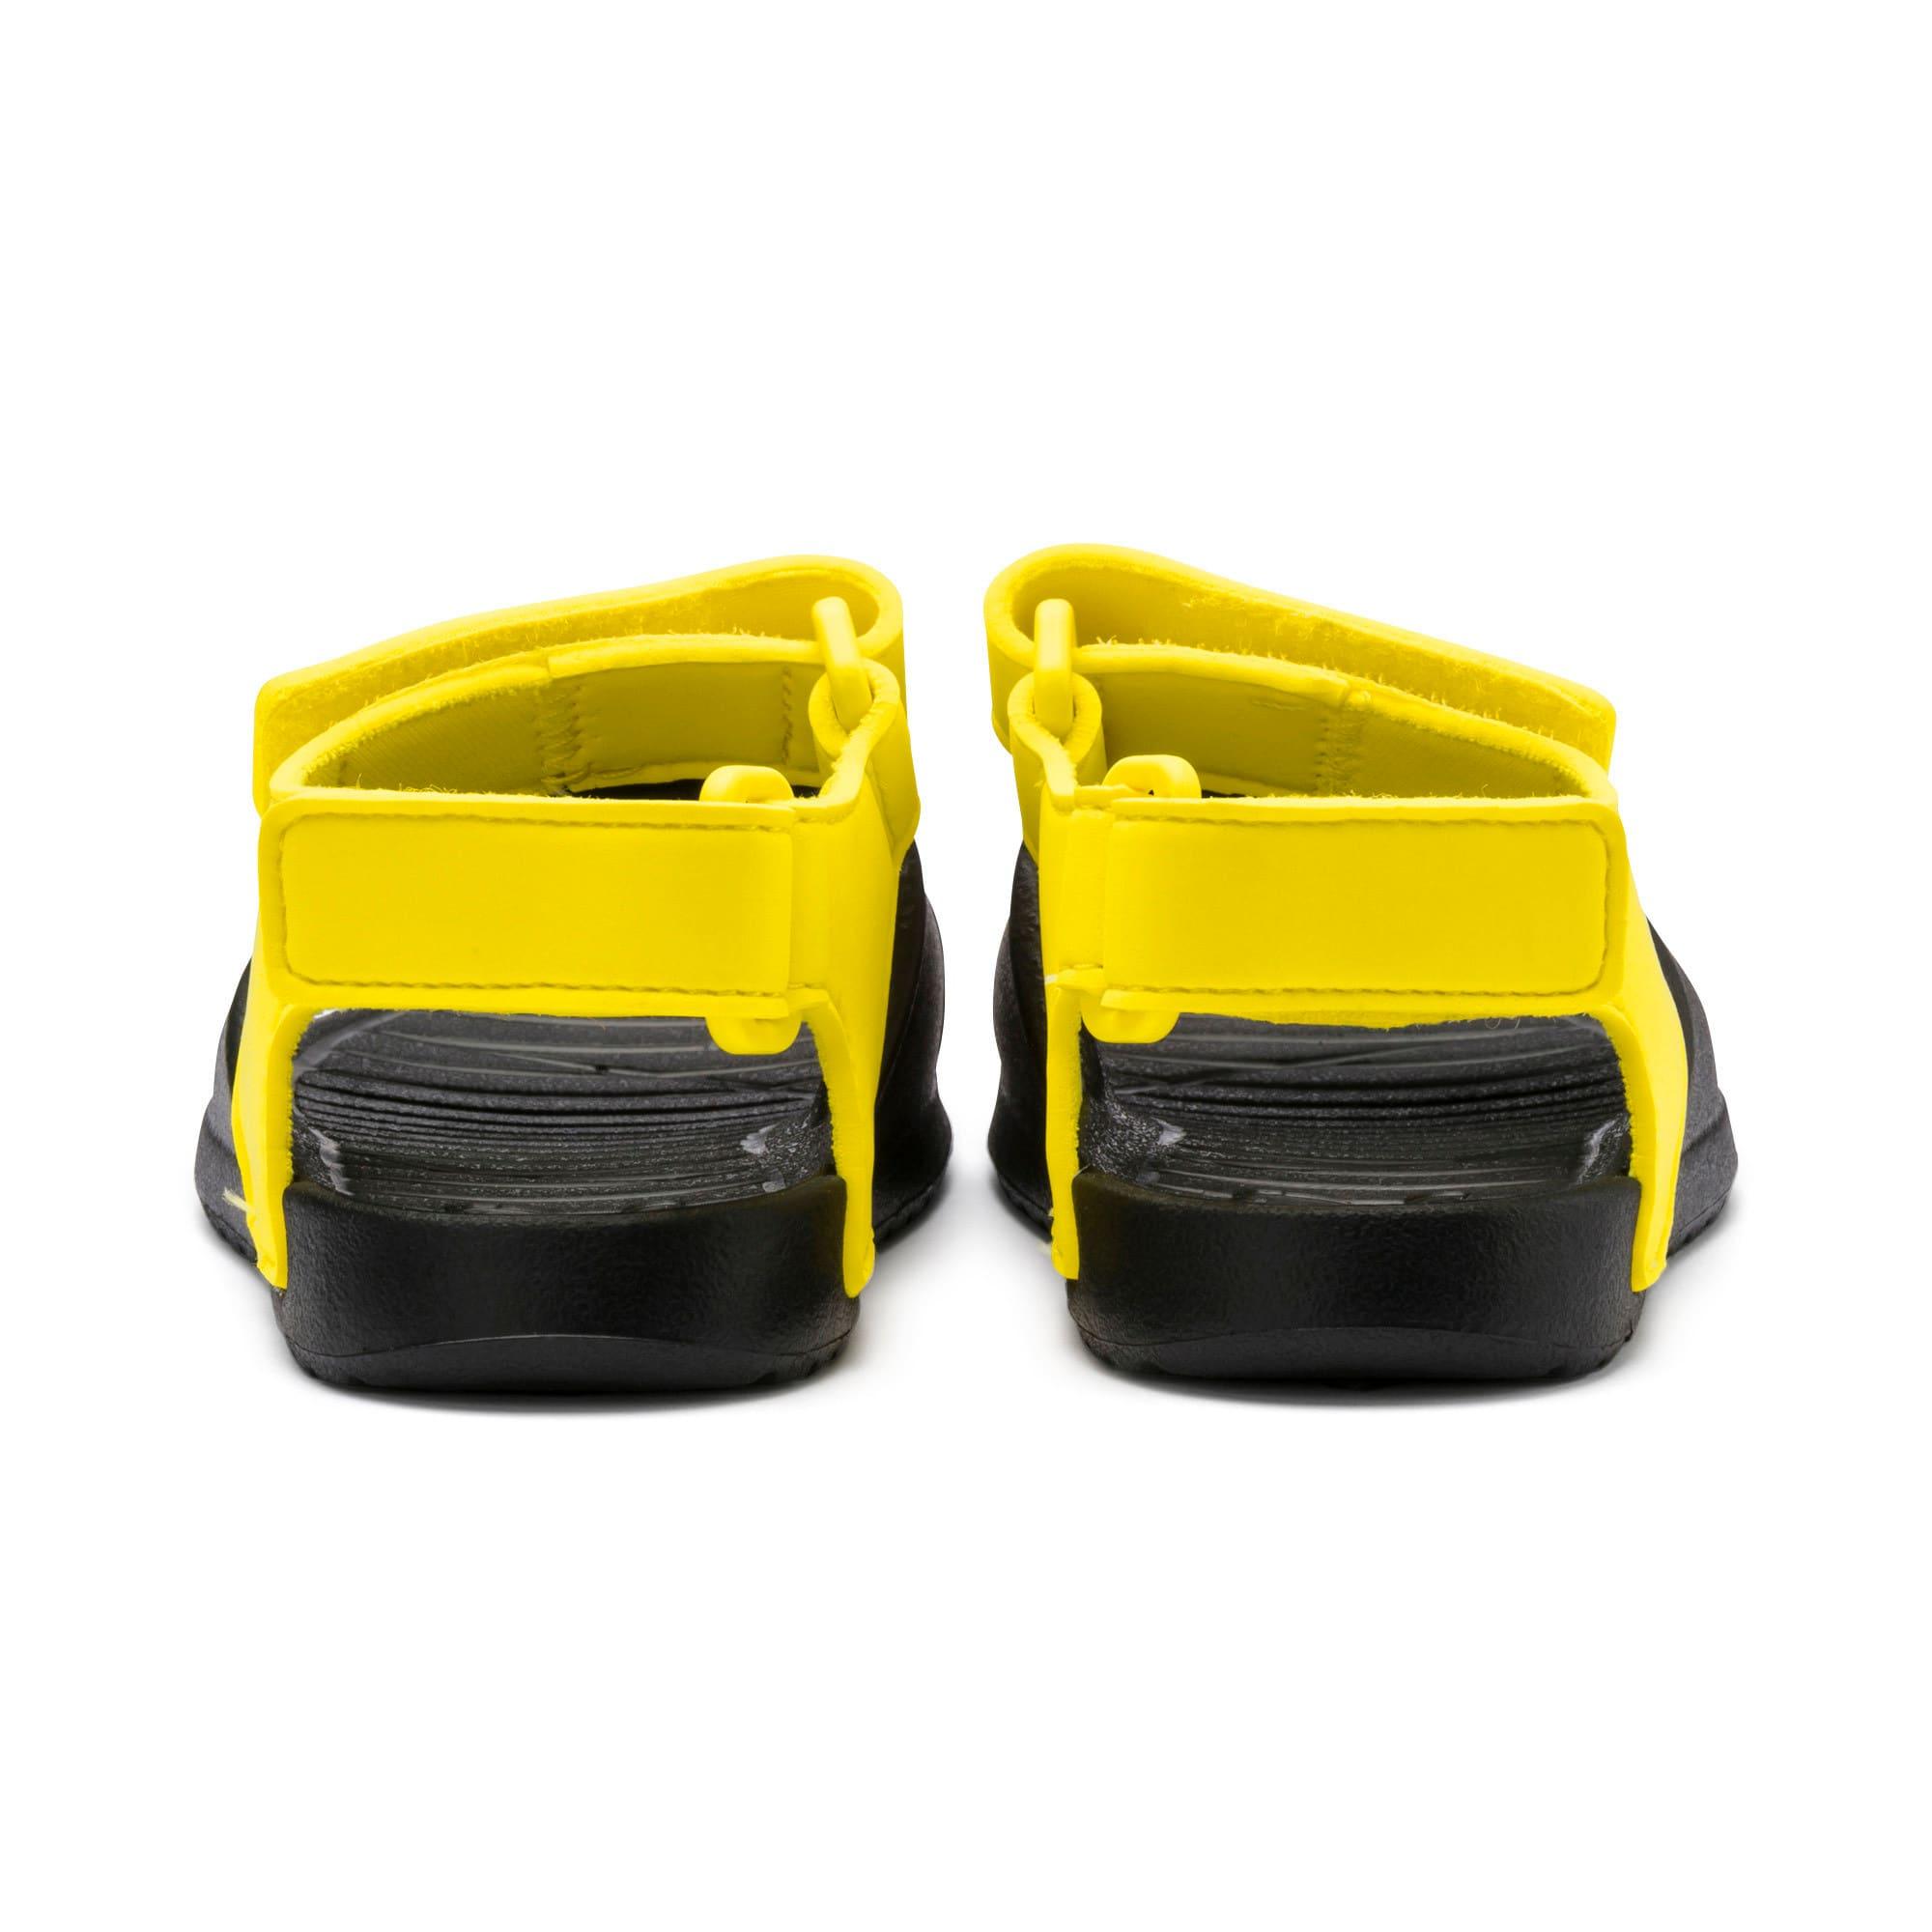 Thumbnail 3 of Divecat v2 Injex Kids' Sandals, Puma Black-Blazing Yellow, medium